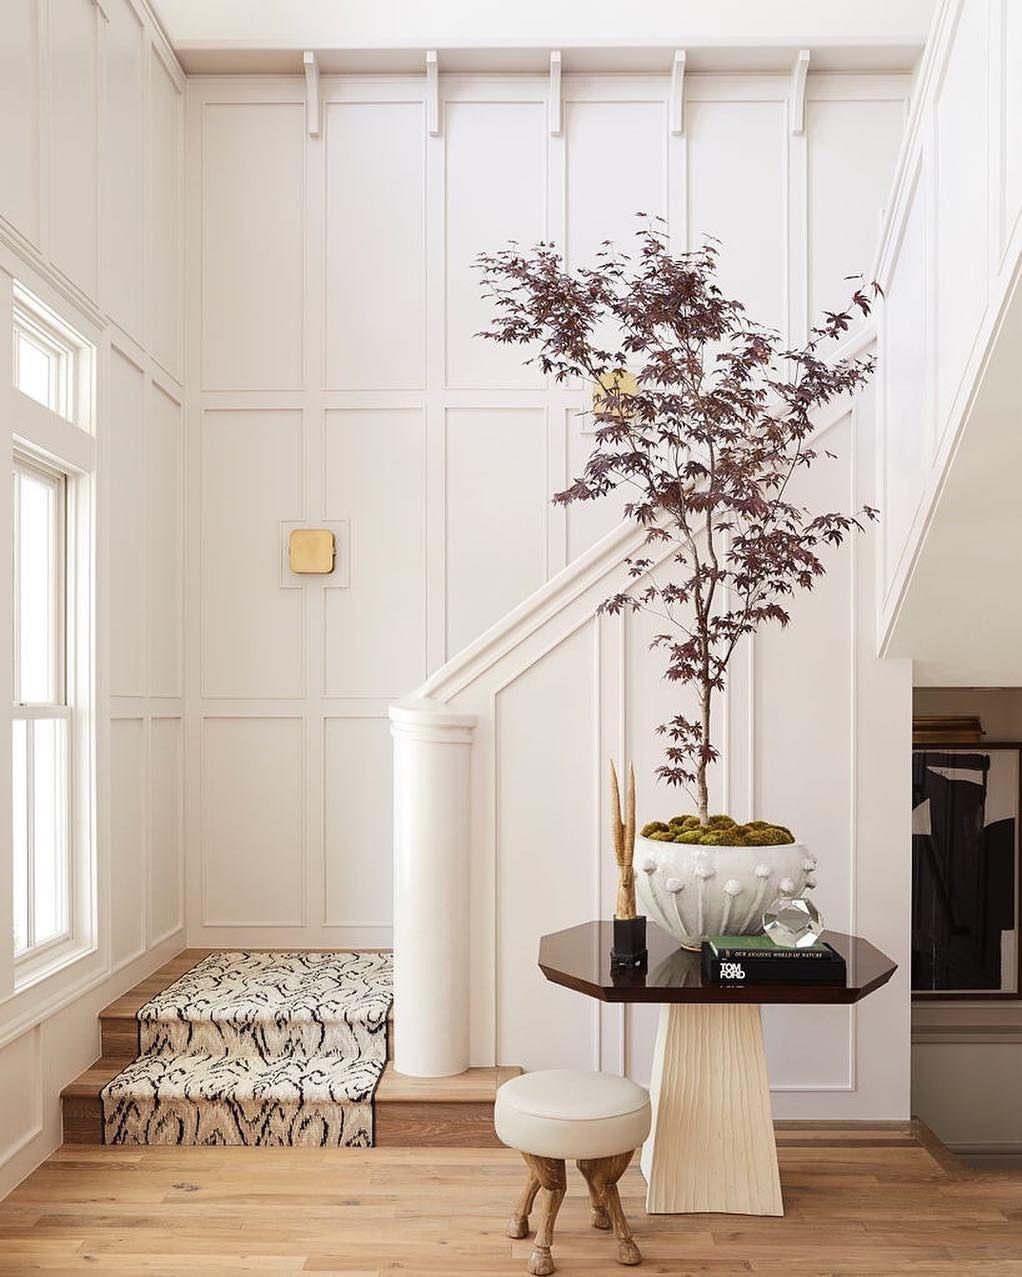 Alice Lane Interior Design On Instagram When In Doubt Put A